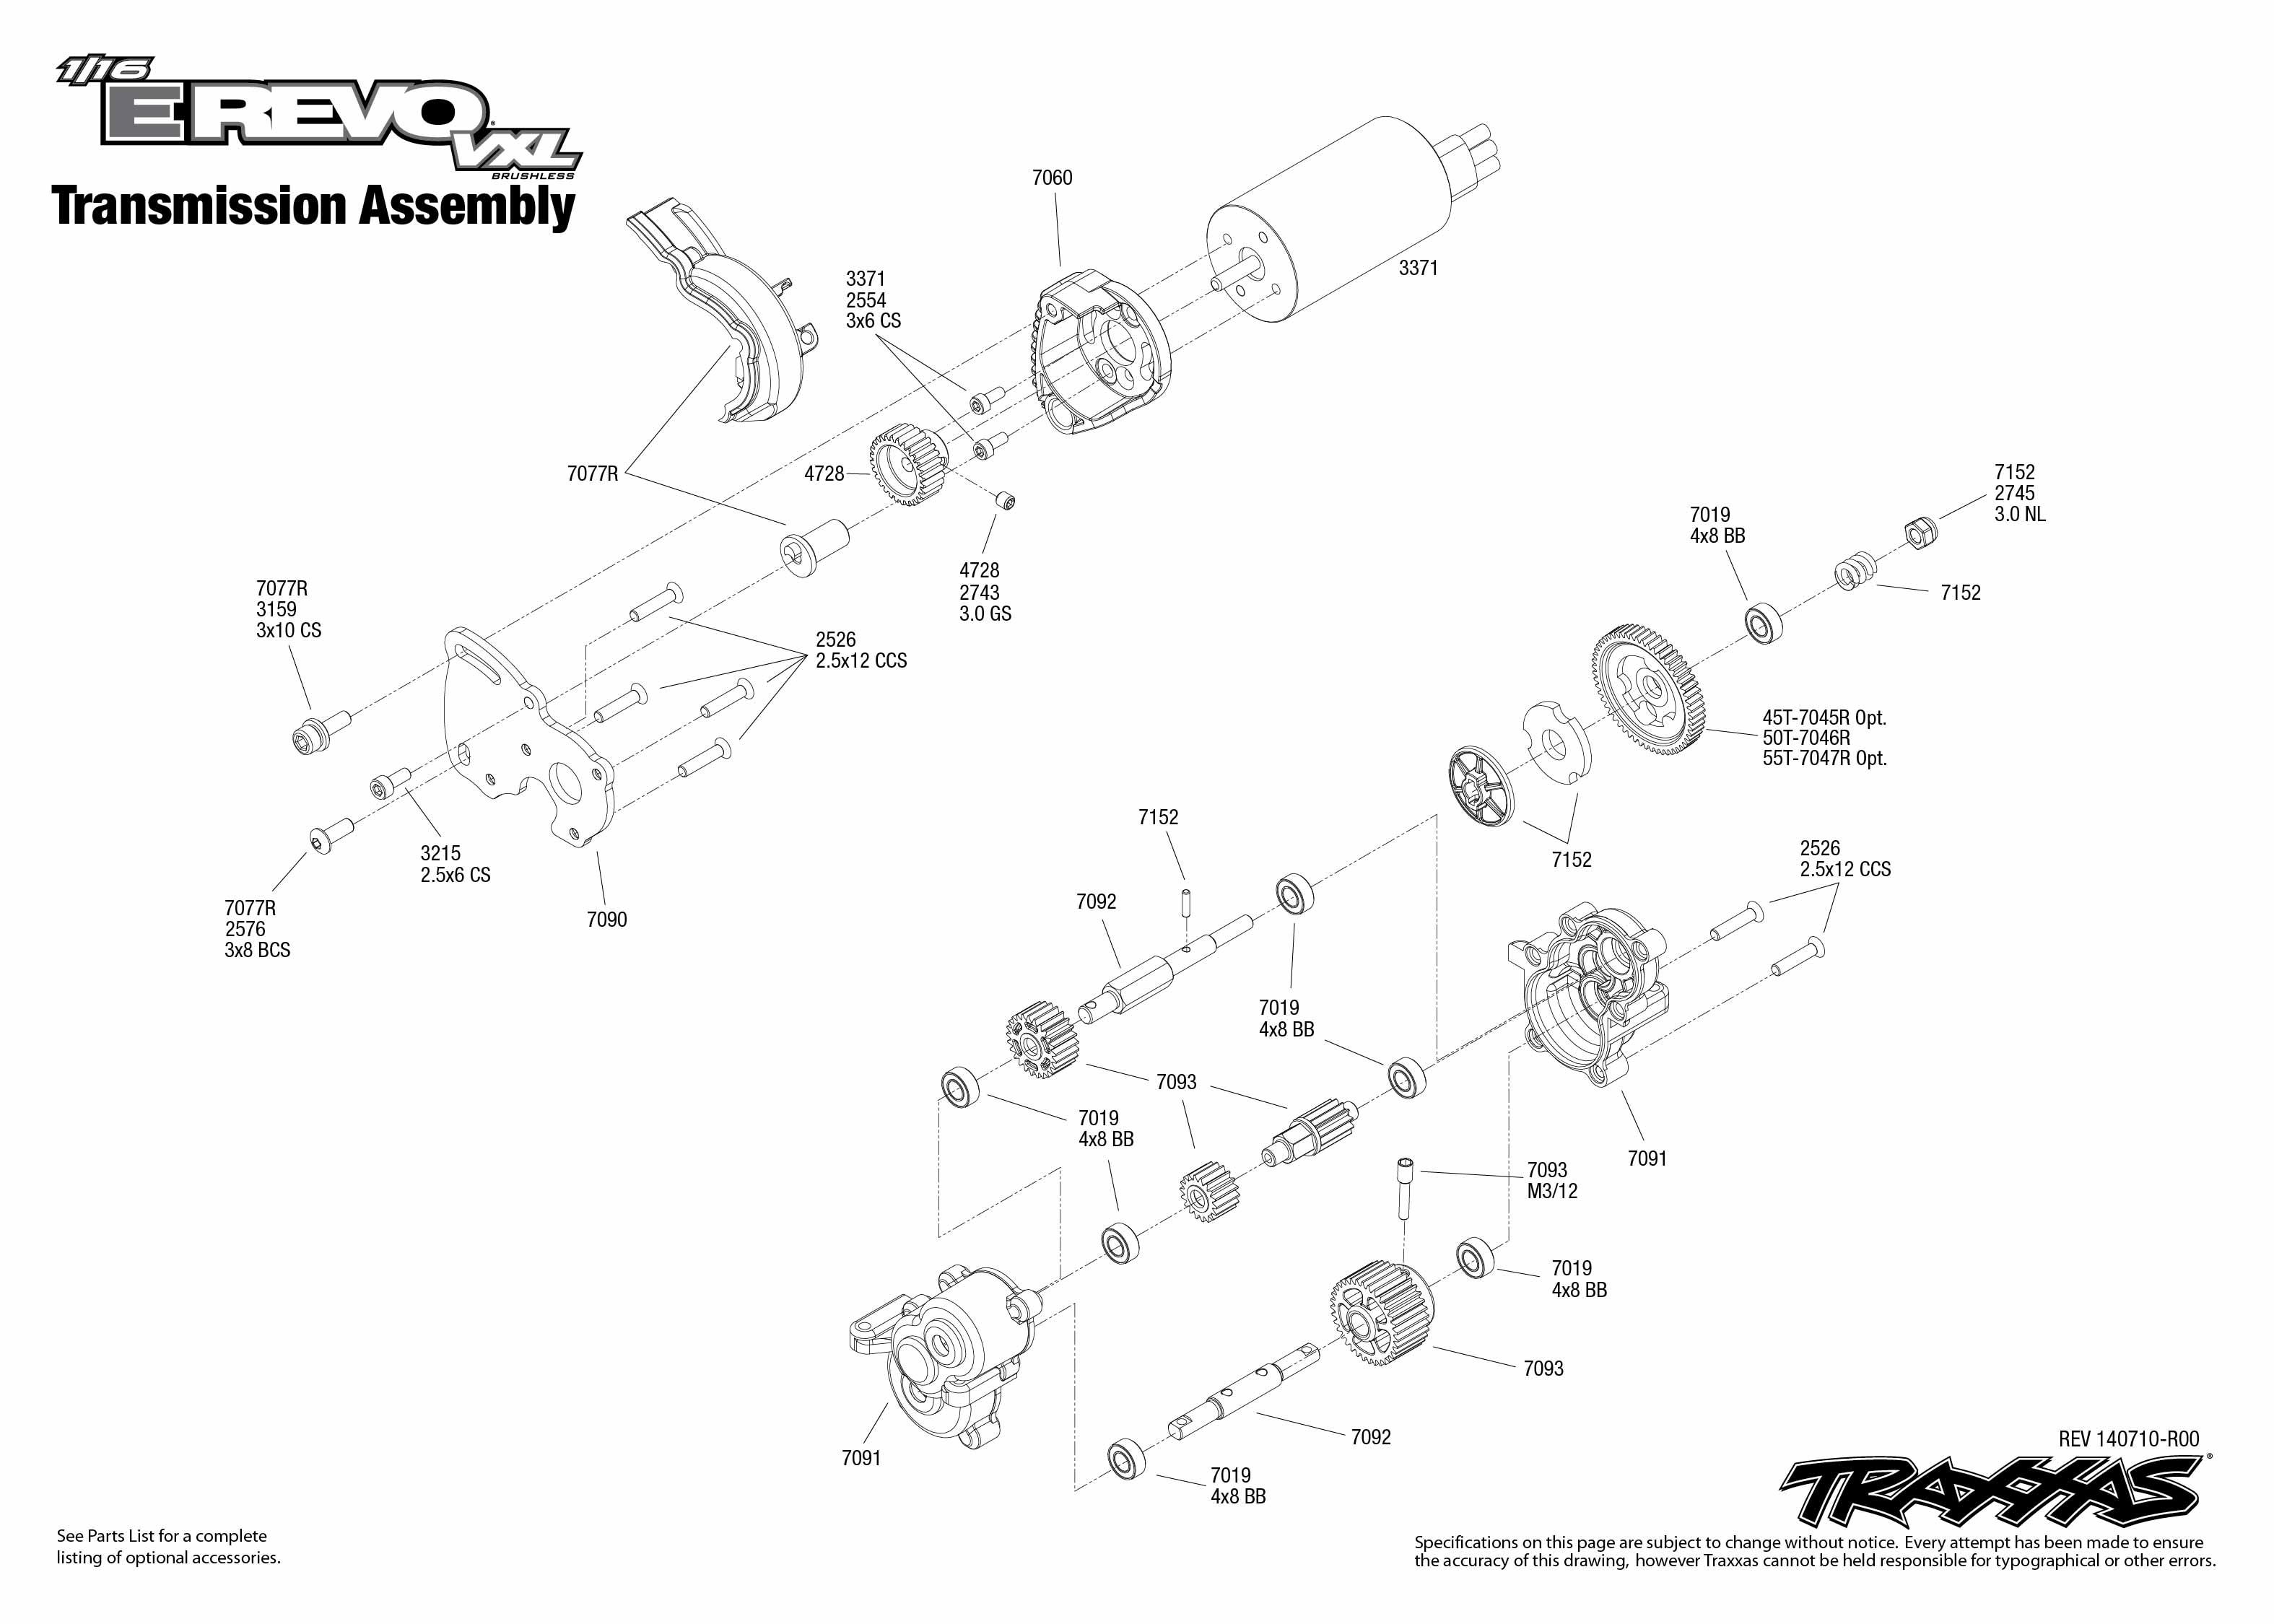 1/16 E-Revo VXL (71074-1) Transmission Assembly Exploded